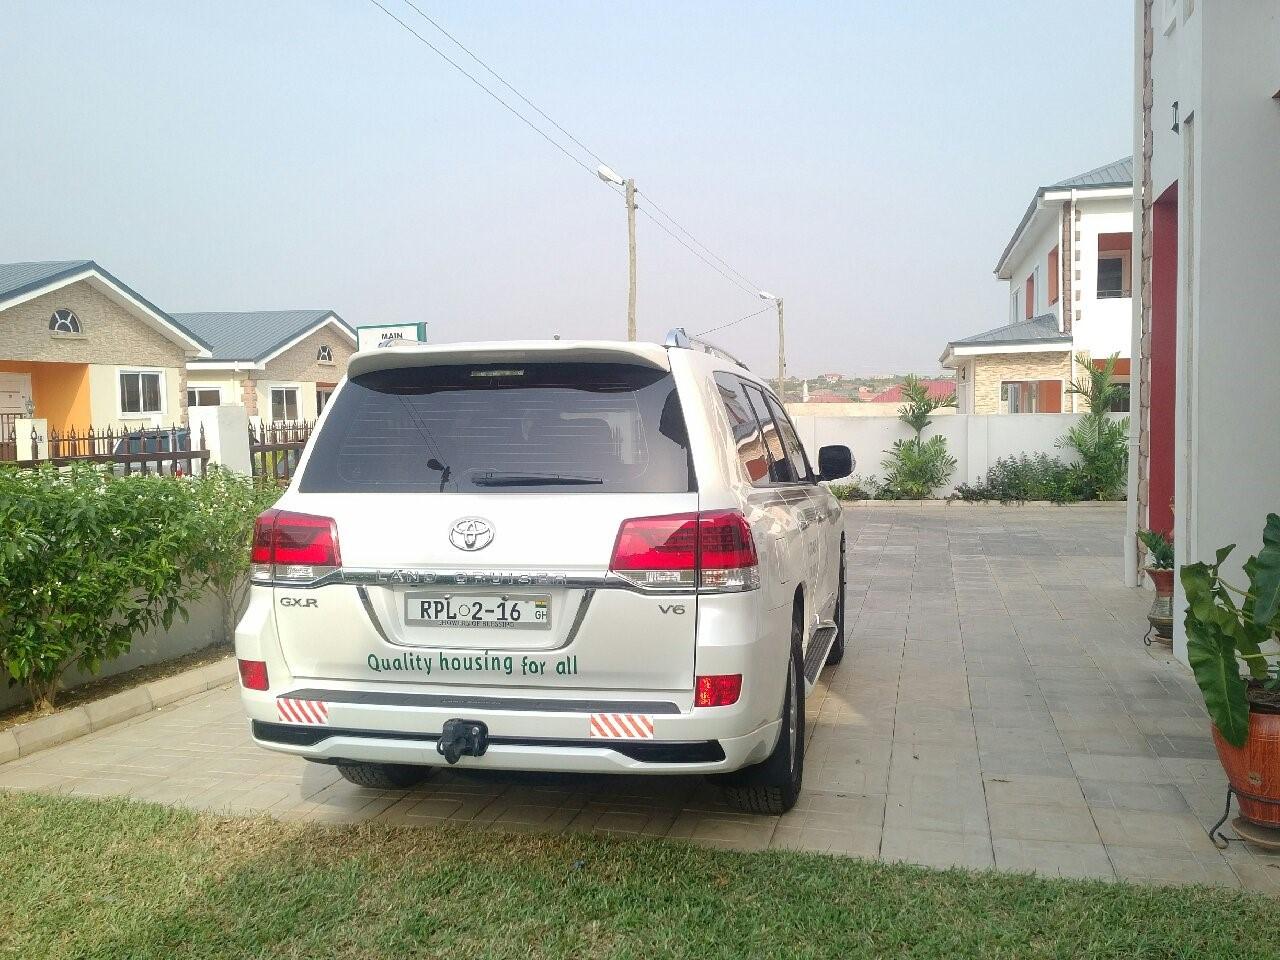 RPL vehicle